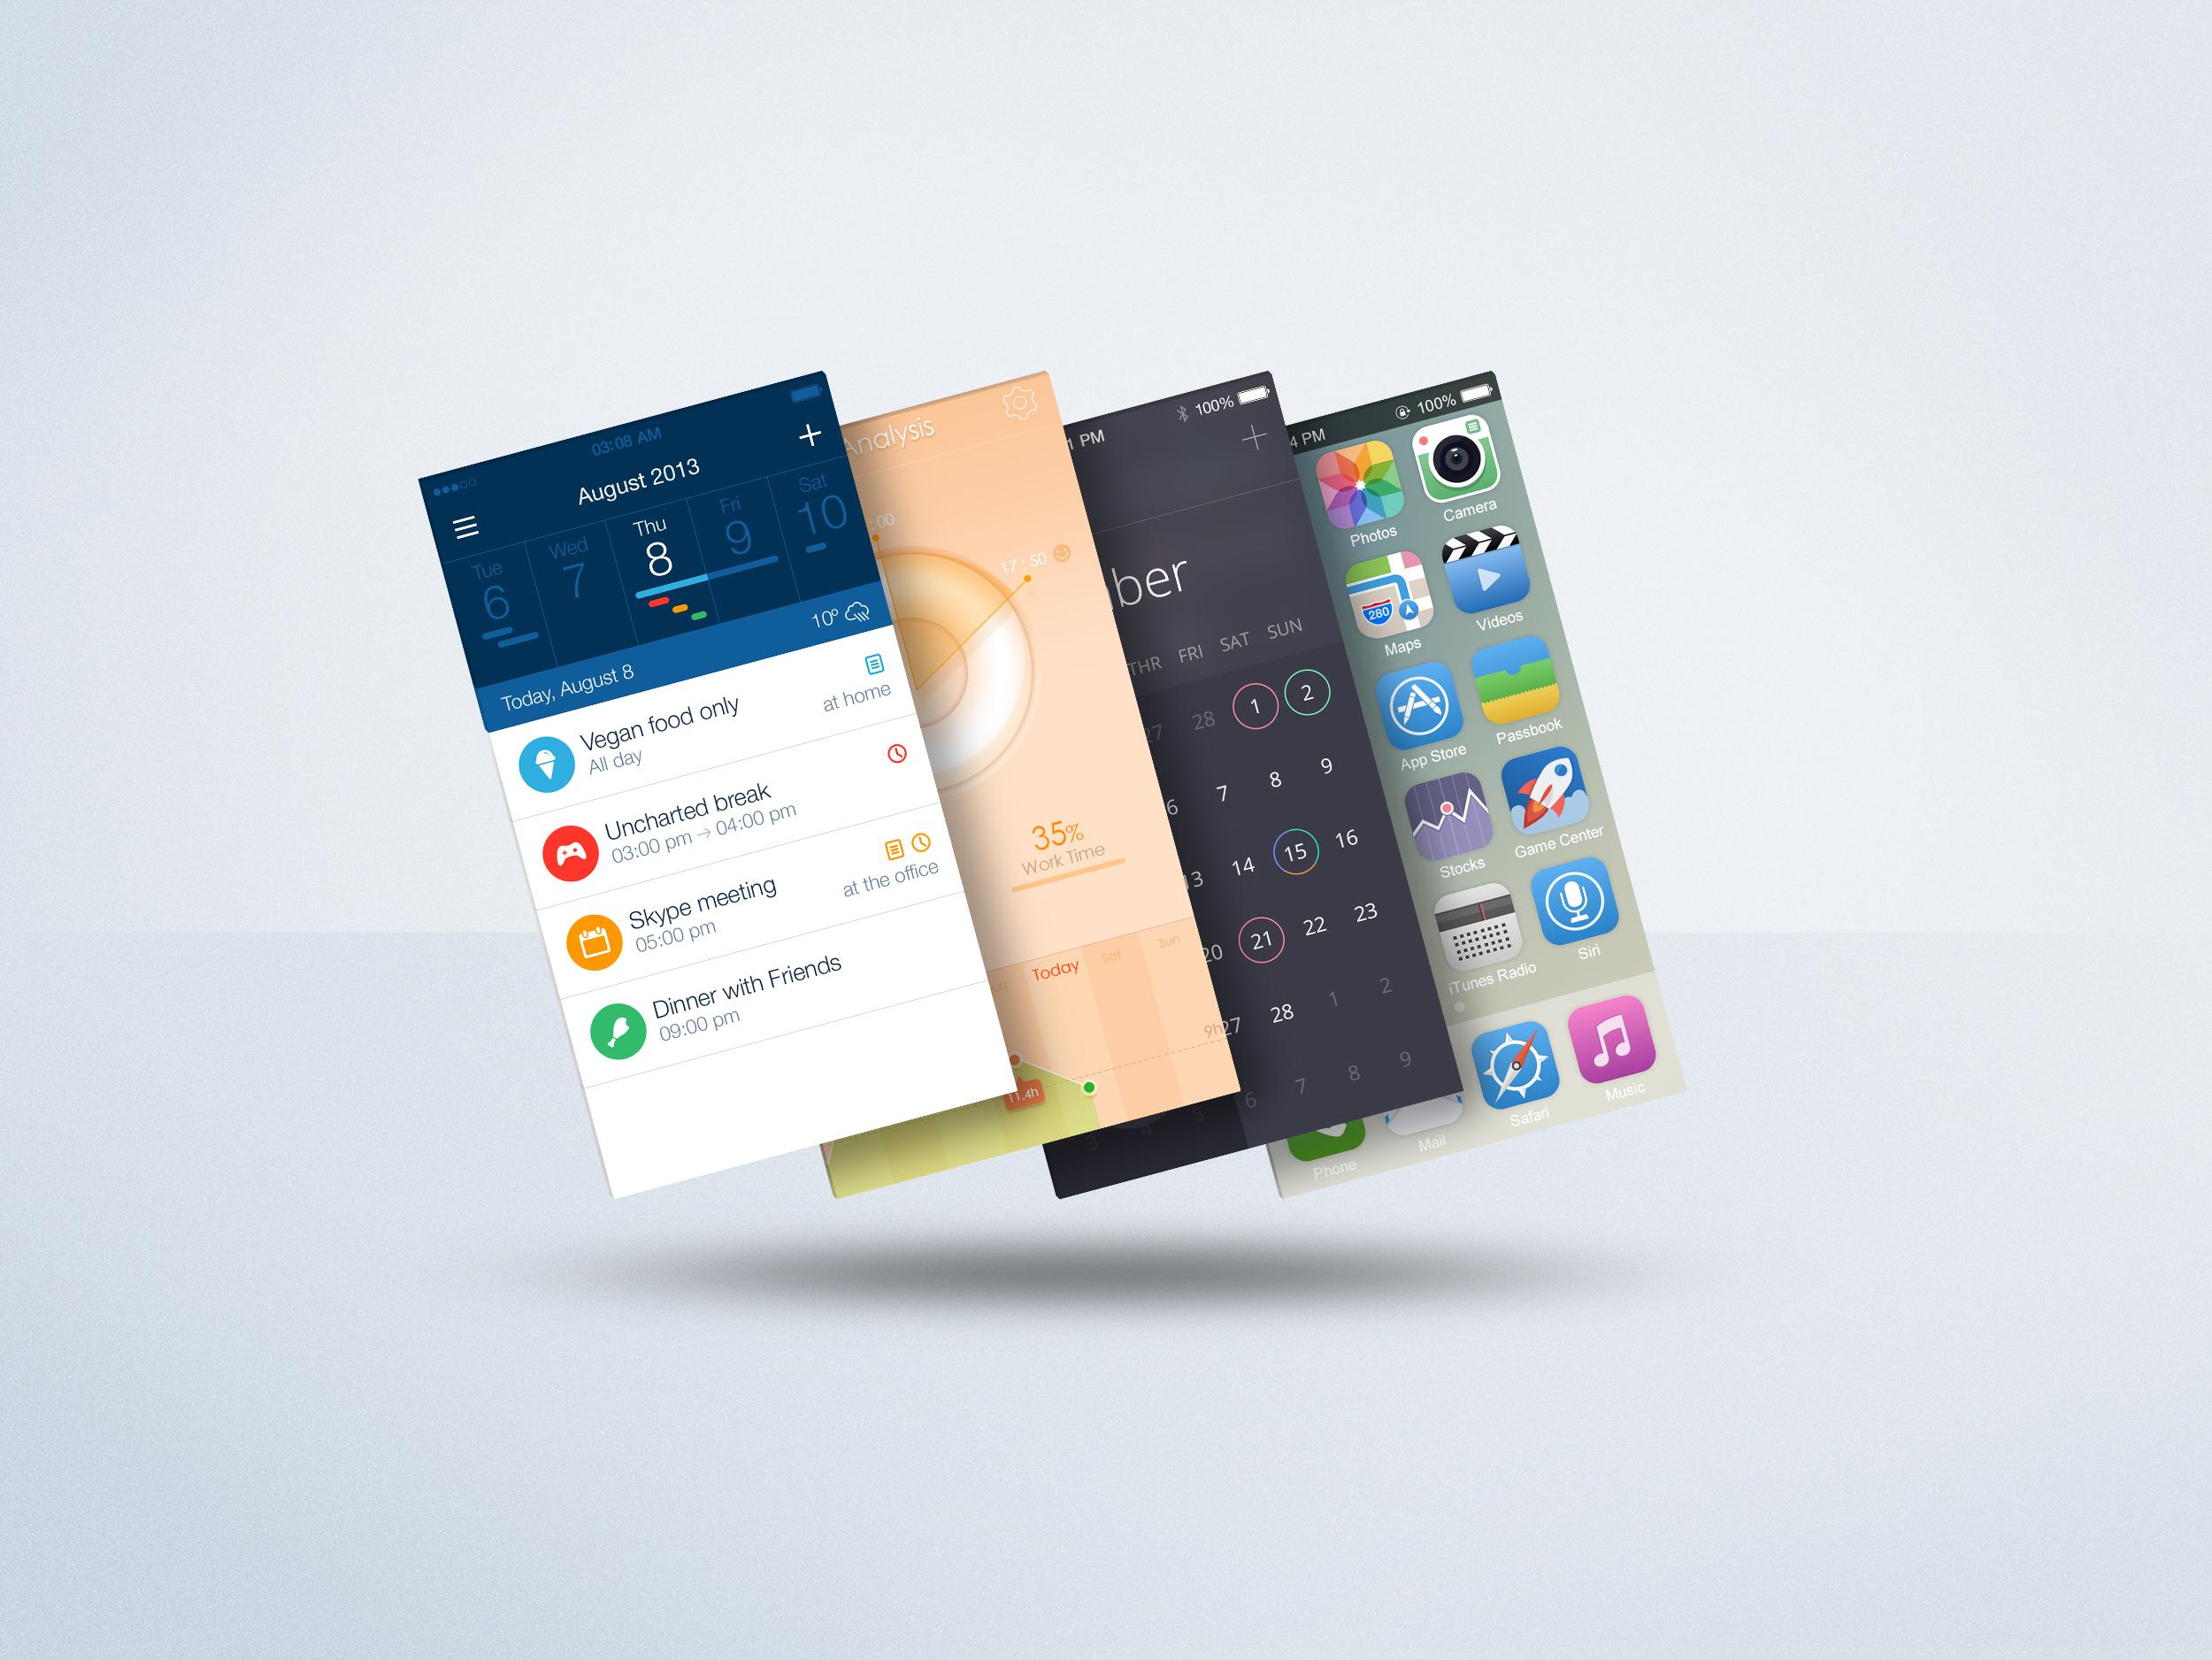 Floating Mobile Display Mock-Up PSD Freebie on Behance